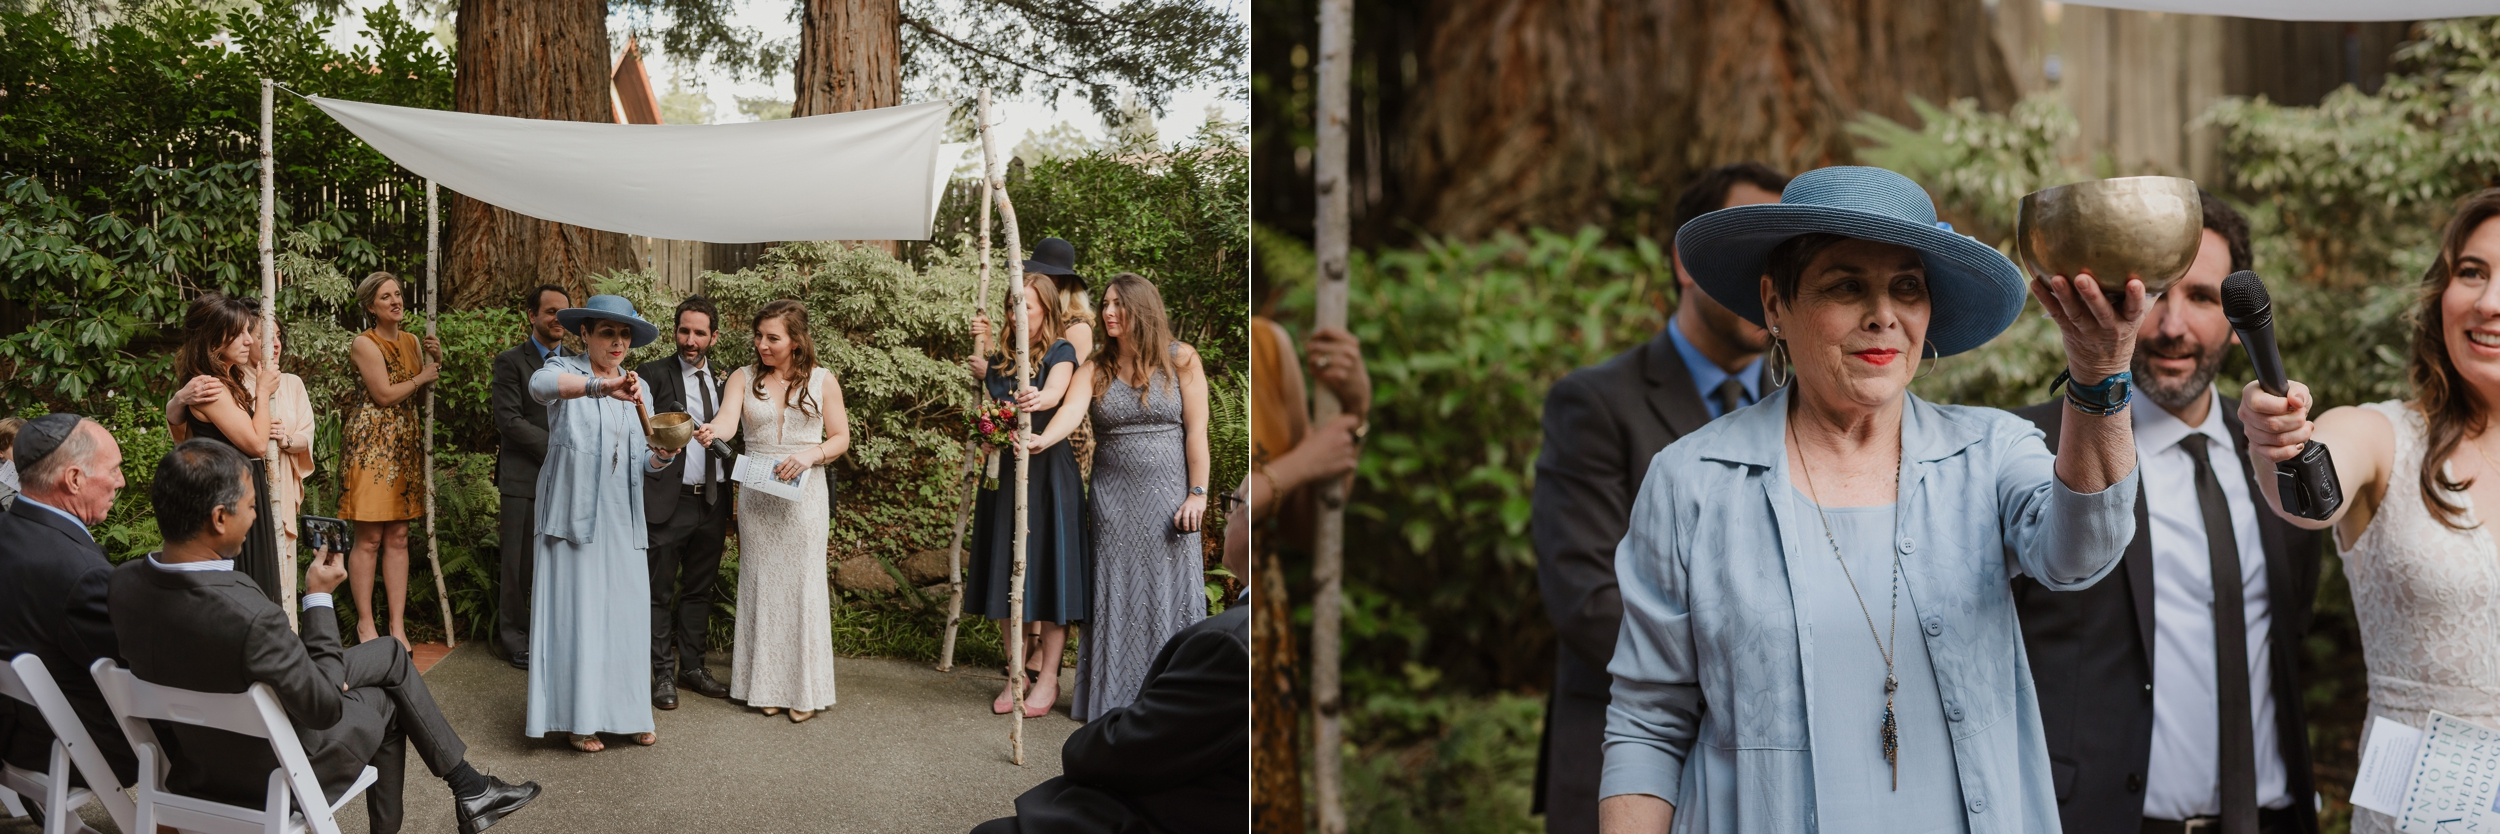 036winter-mill-valley-wedding-outdoor-art-club-wedding-vivianchen-187_WEB.jpg